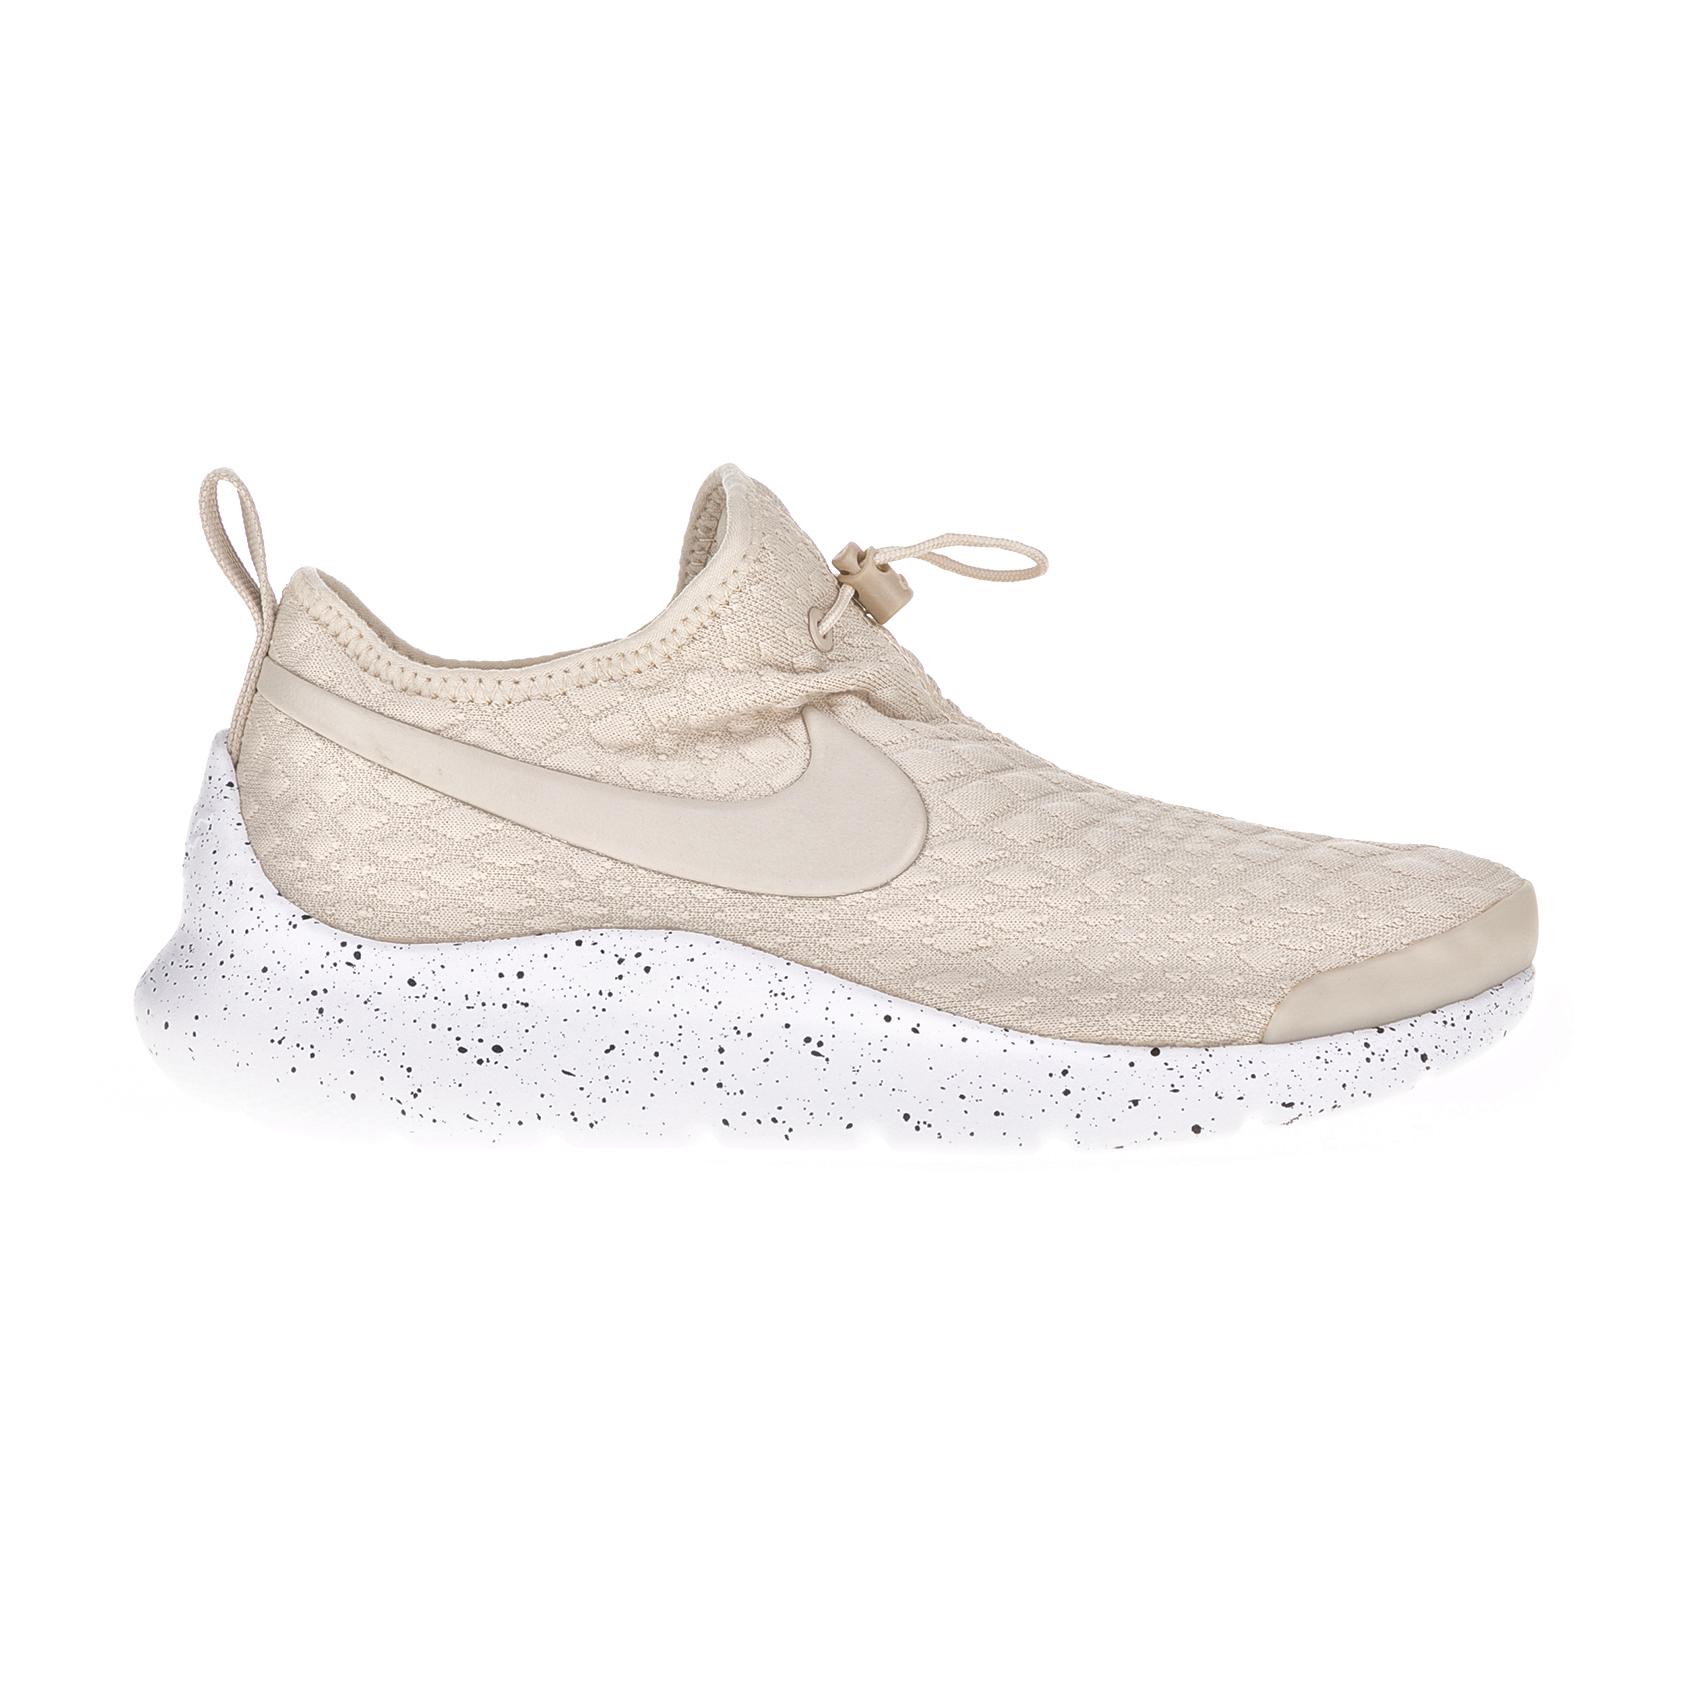 NIKE – Γυναικεία αθλητικά παπούτσια NIKE APTARE μπεζ